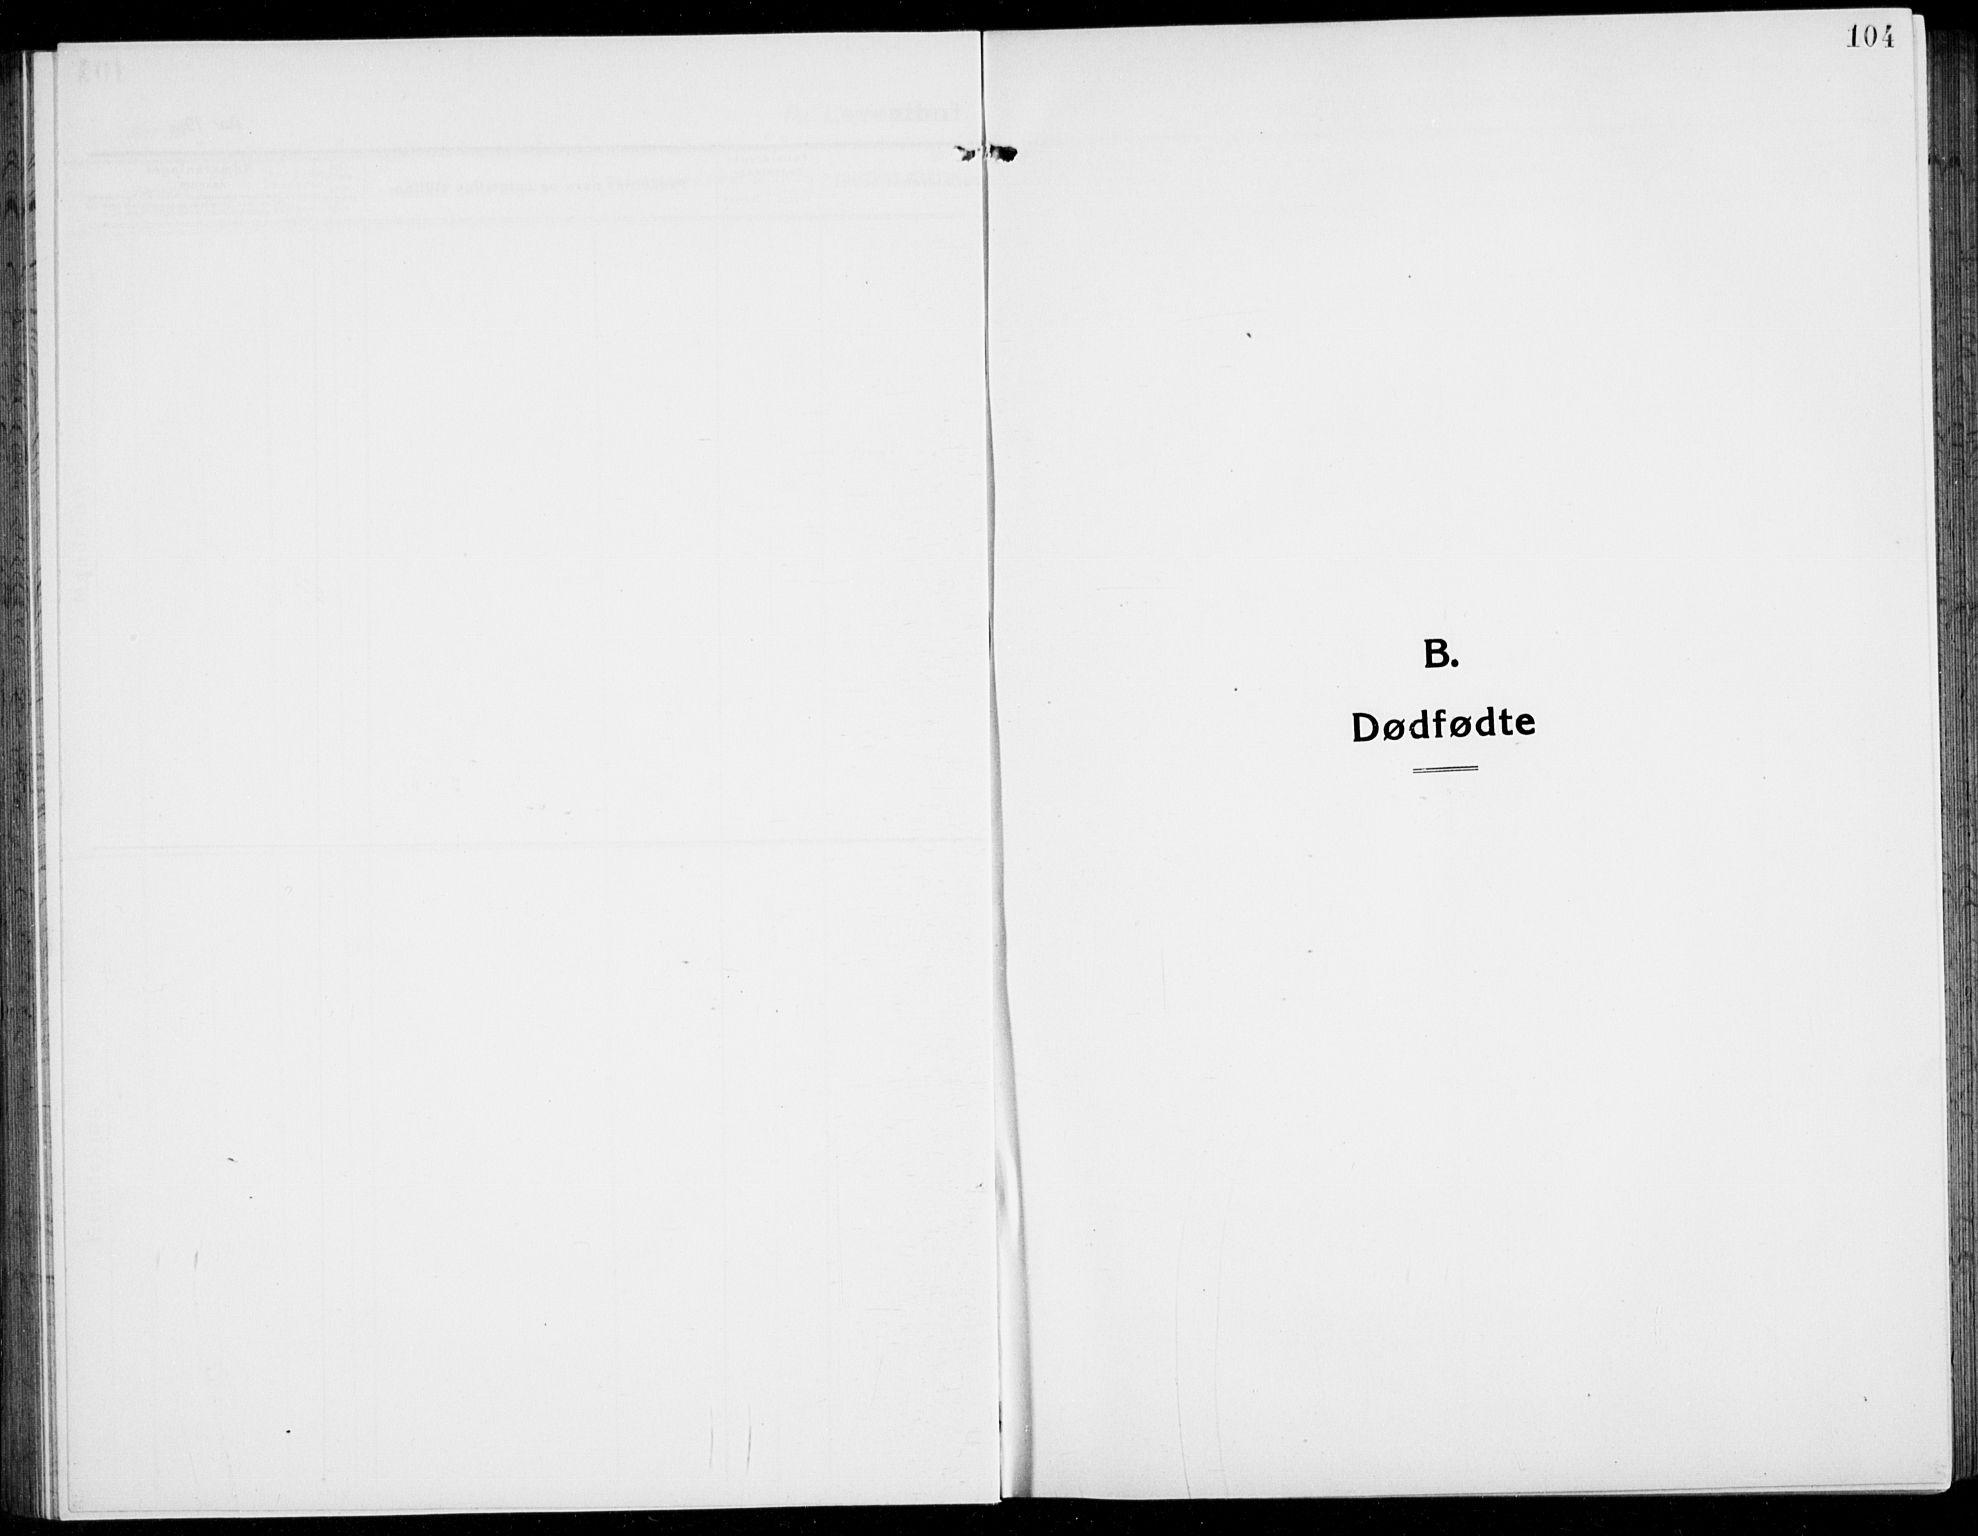 SAKO, Brunlanes kirkebøker, G/Ga/L0005: Klokkerbok nr. I 5, 1918-1941, s. 104